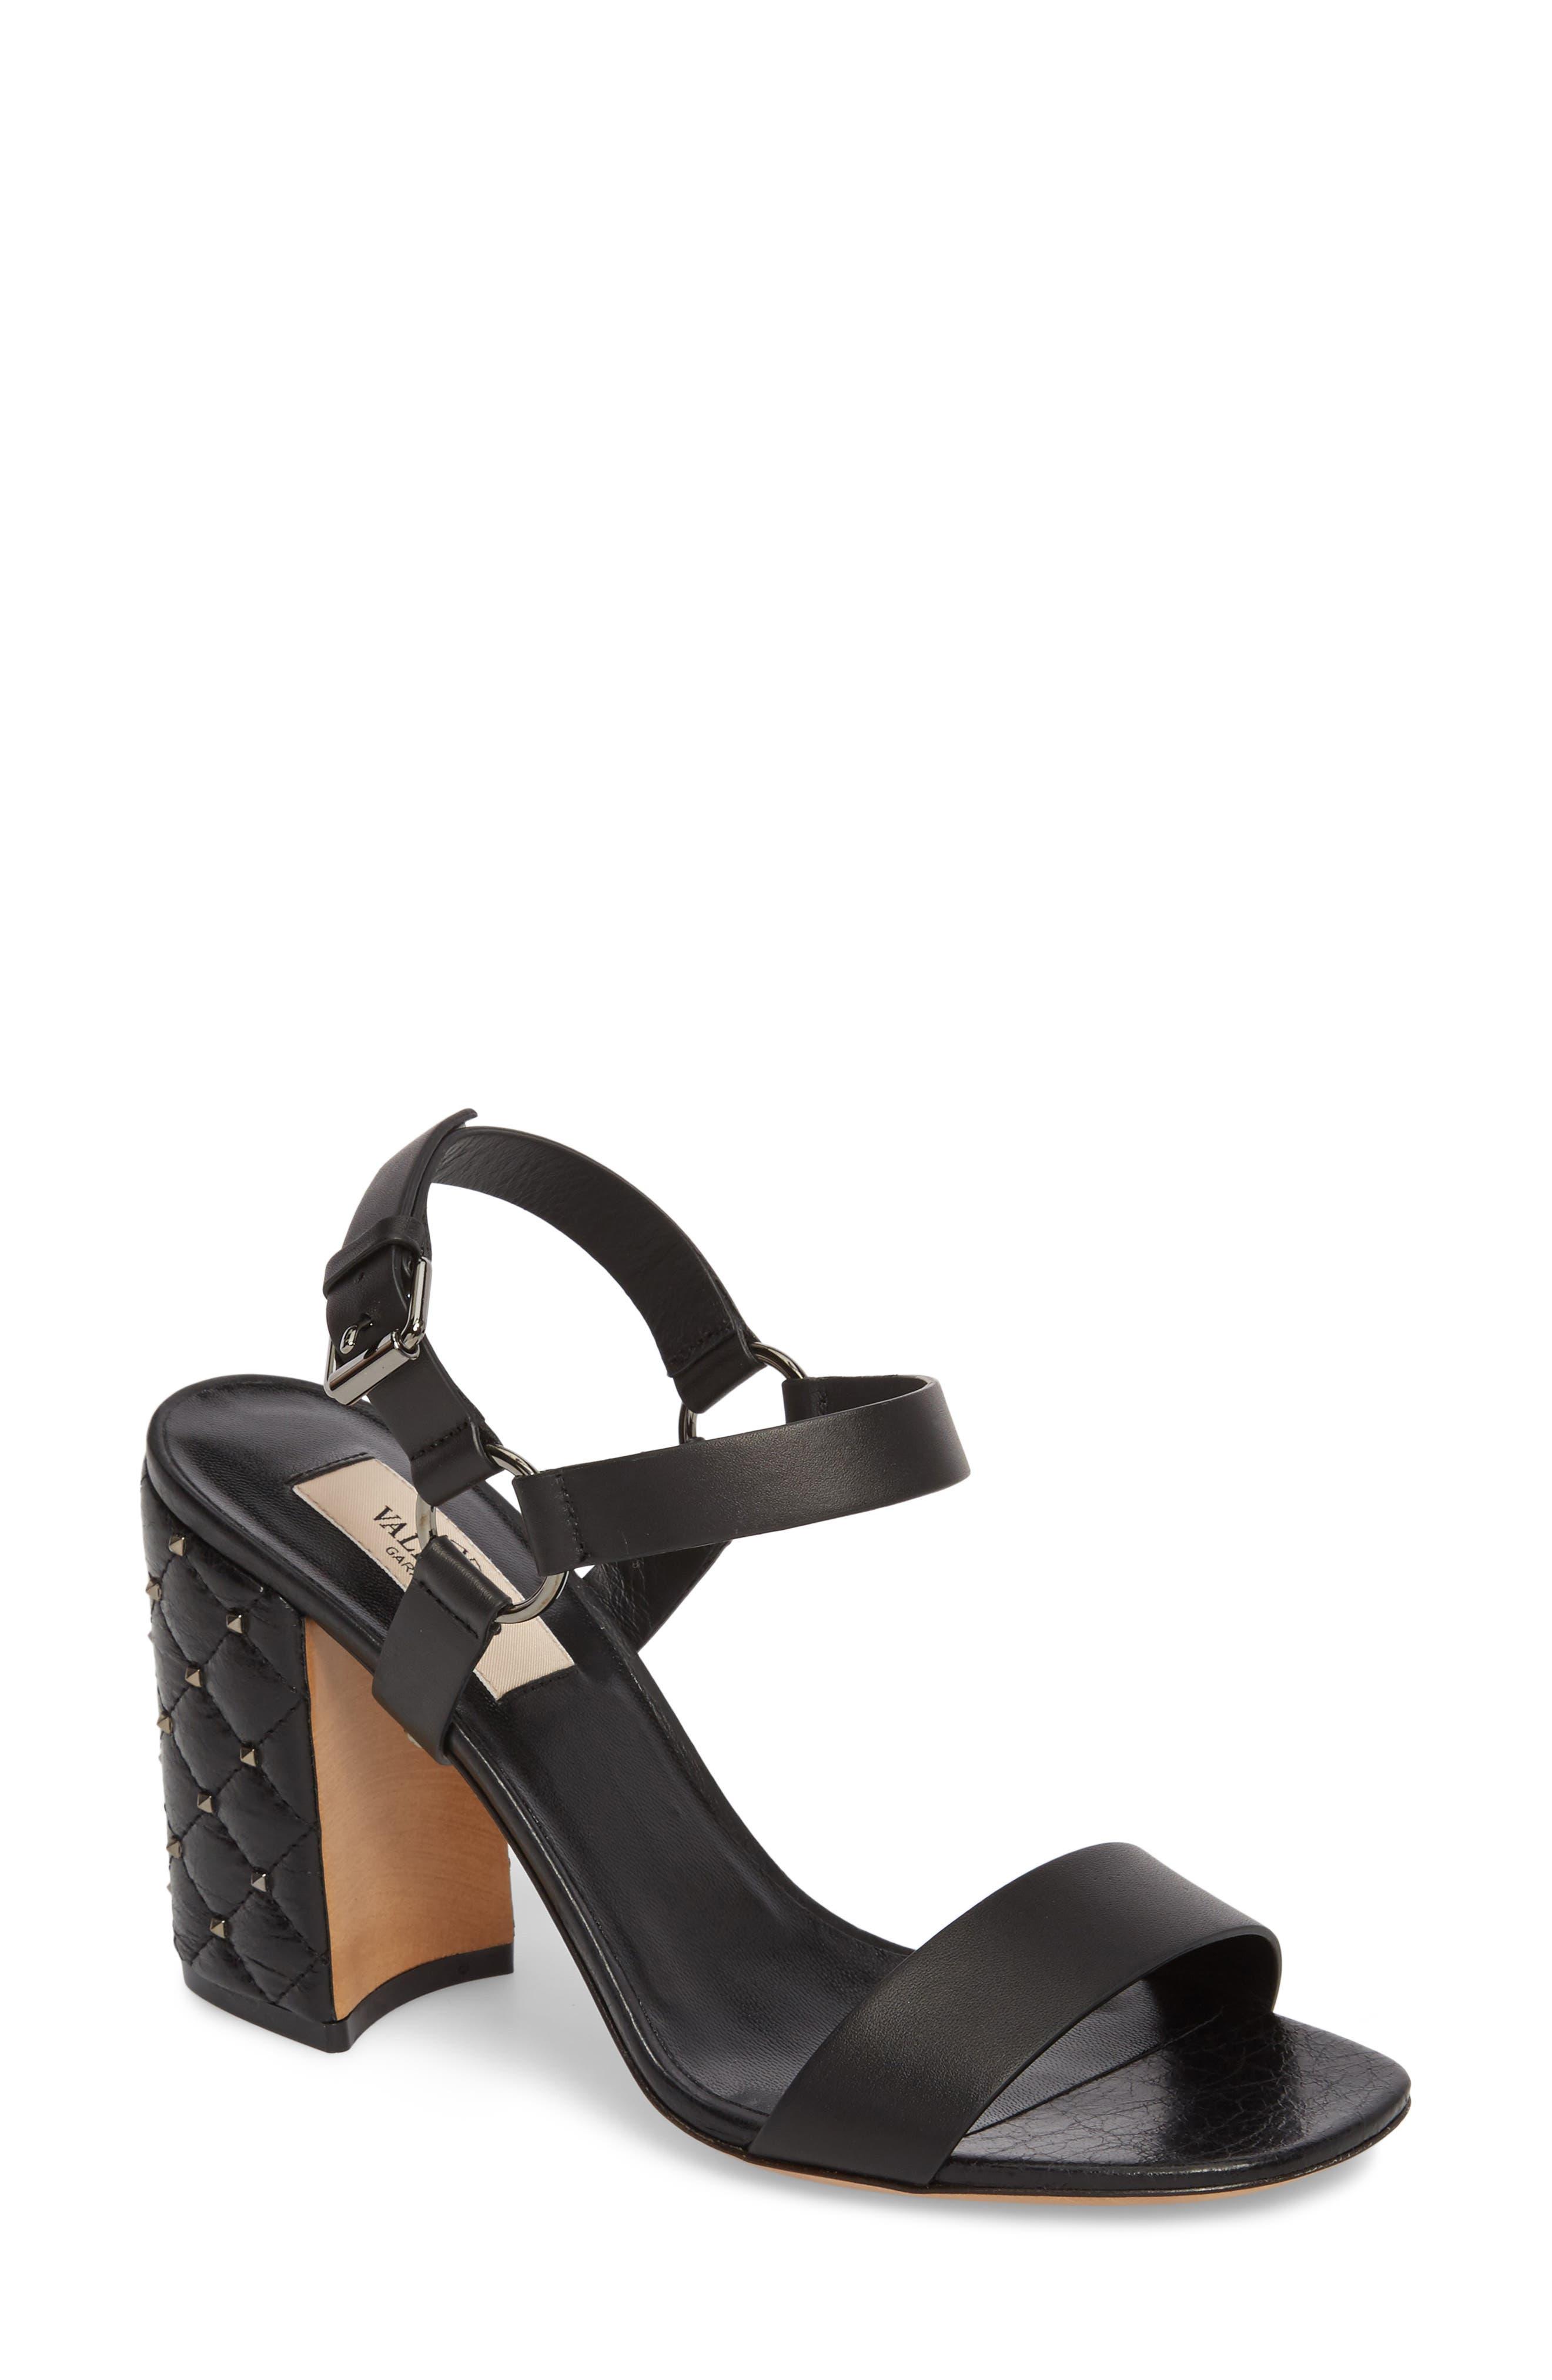 Alternate Image 1 Selected - VALENTINO GARAVANI Rockstud Sandal (Women)